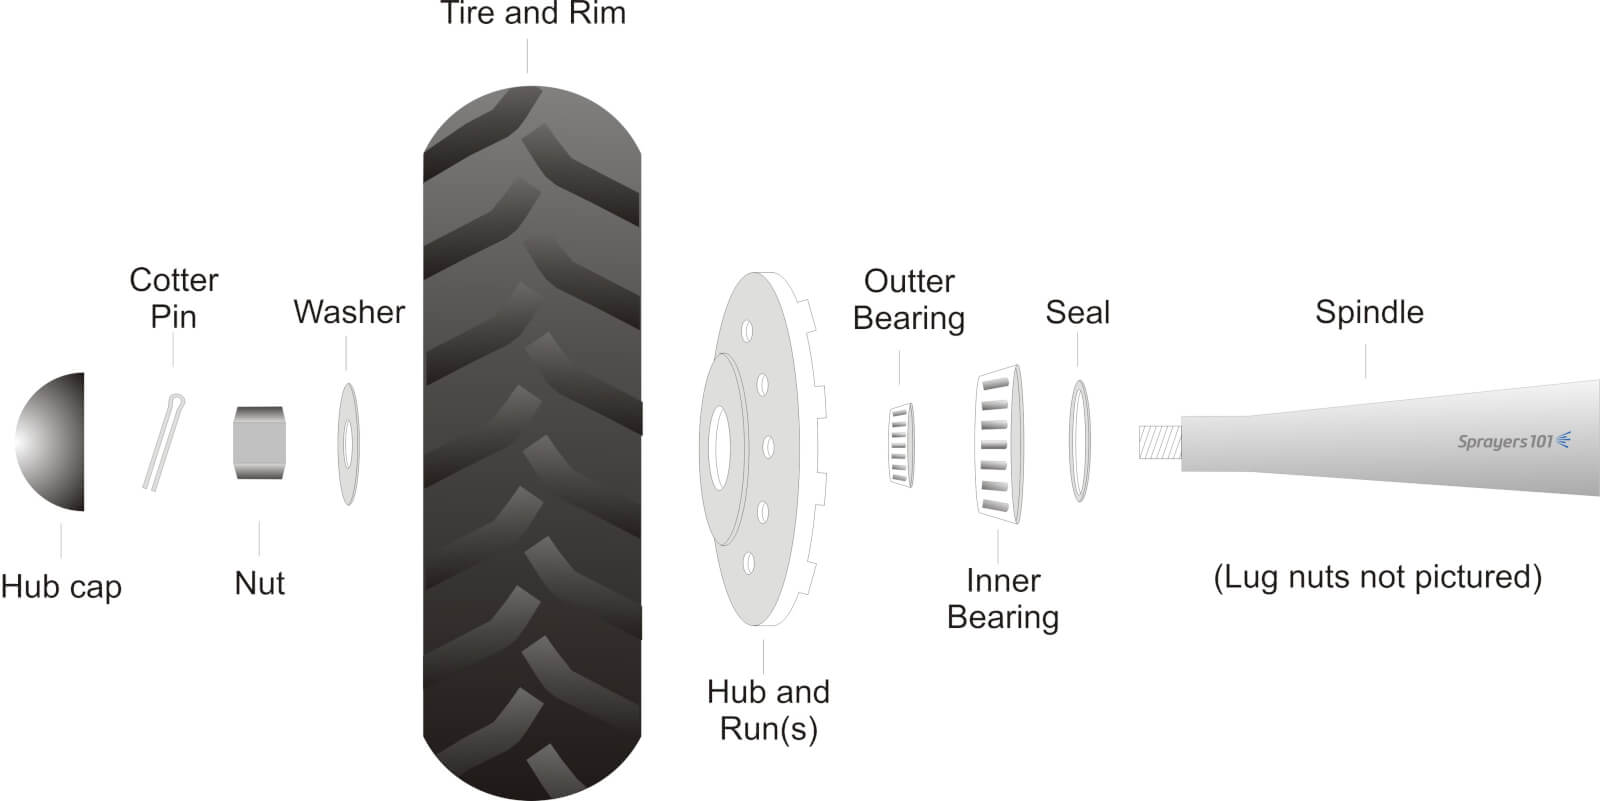 sprayer wheel maintenance sprayers 101 rh sprayers101 com truck wheel hub diagram car wheel hub diagram